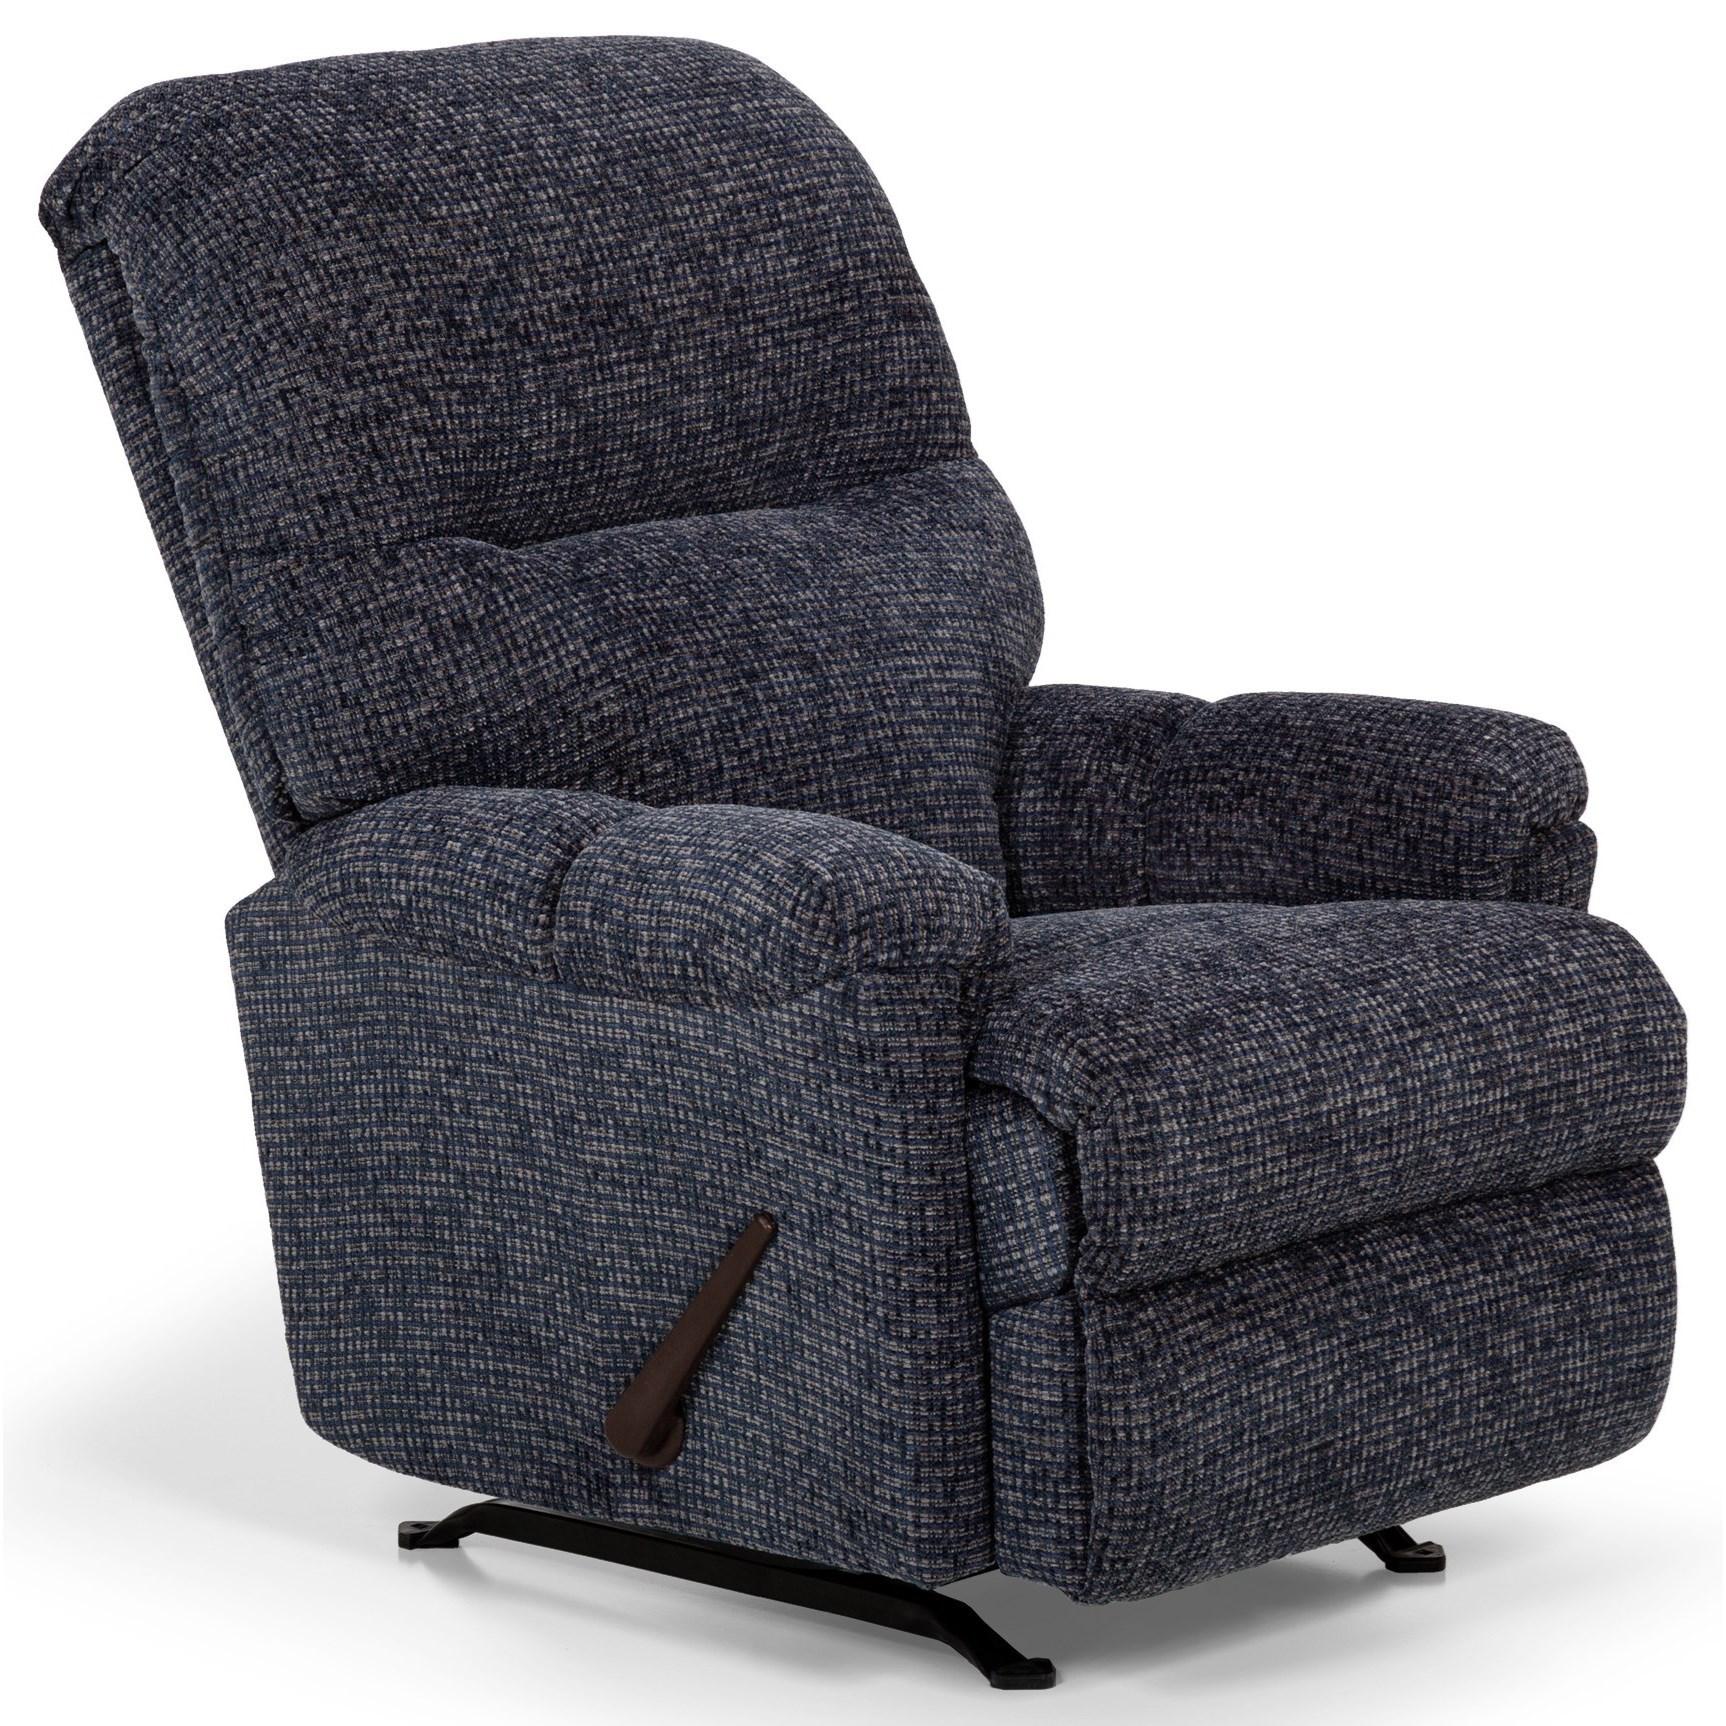 Rocking Reclining Chair